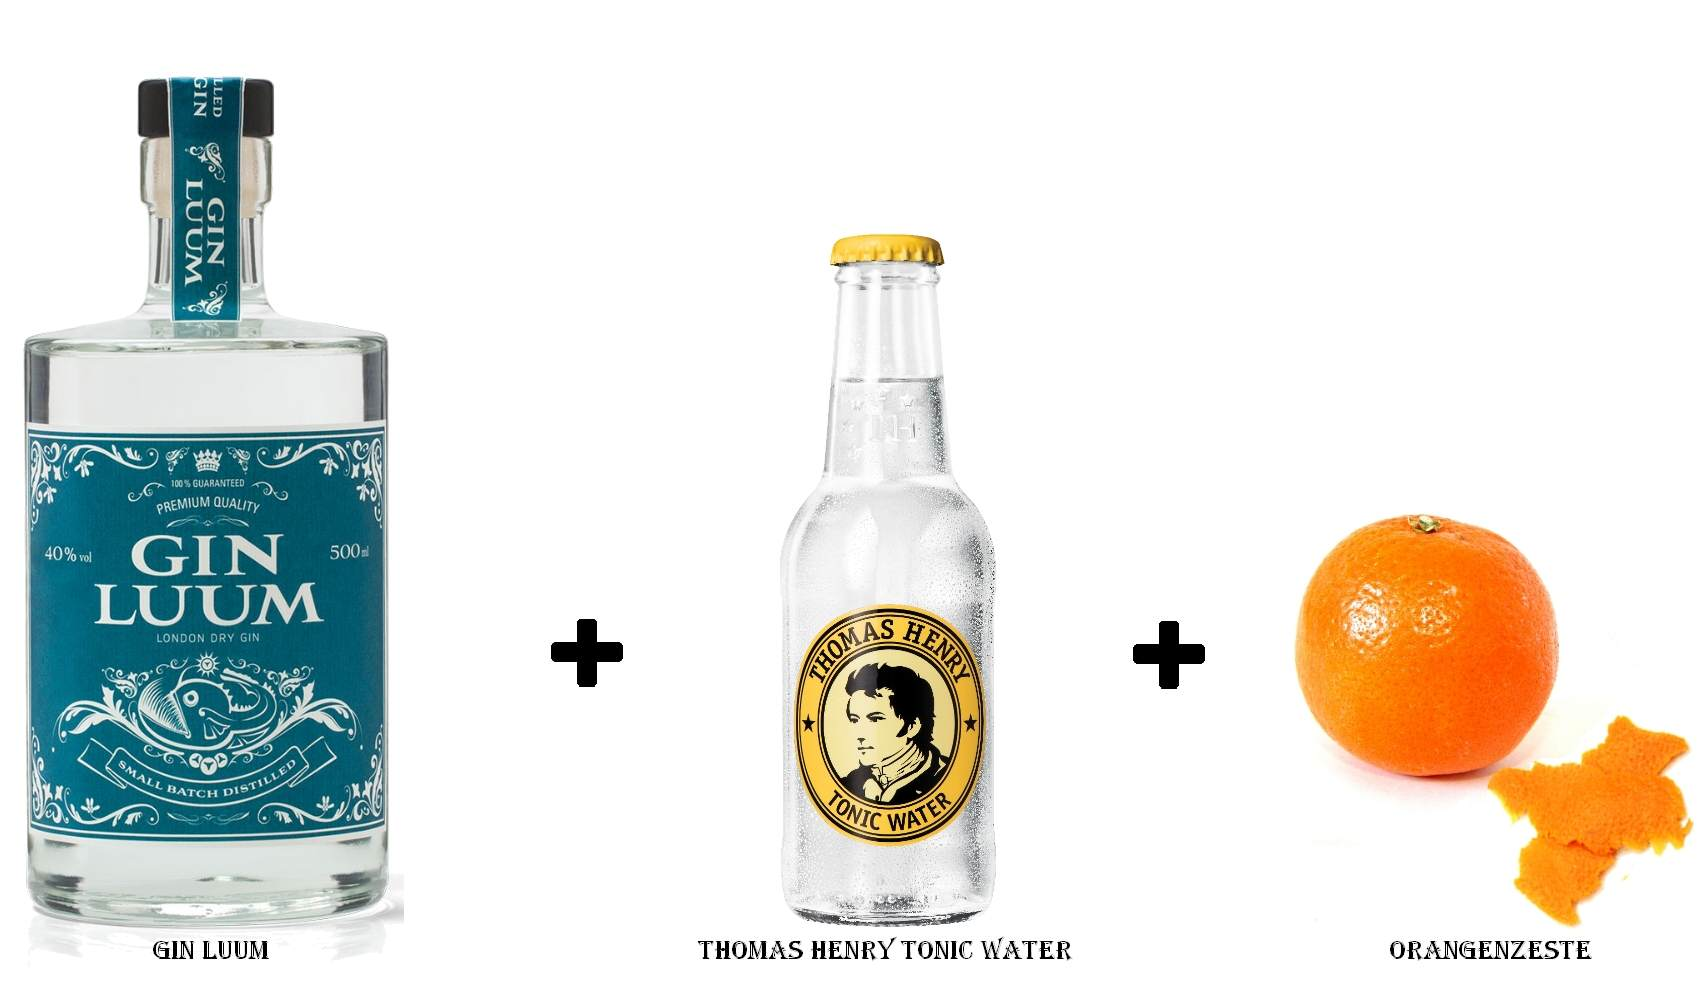 Gin Luum + Thomas Henry Tonic Water + Orangennzeste